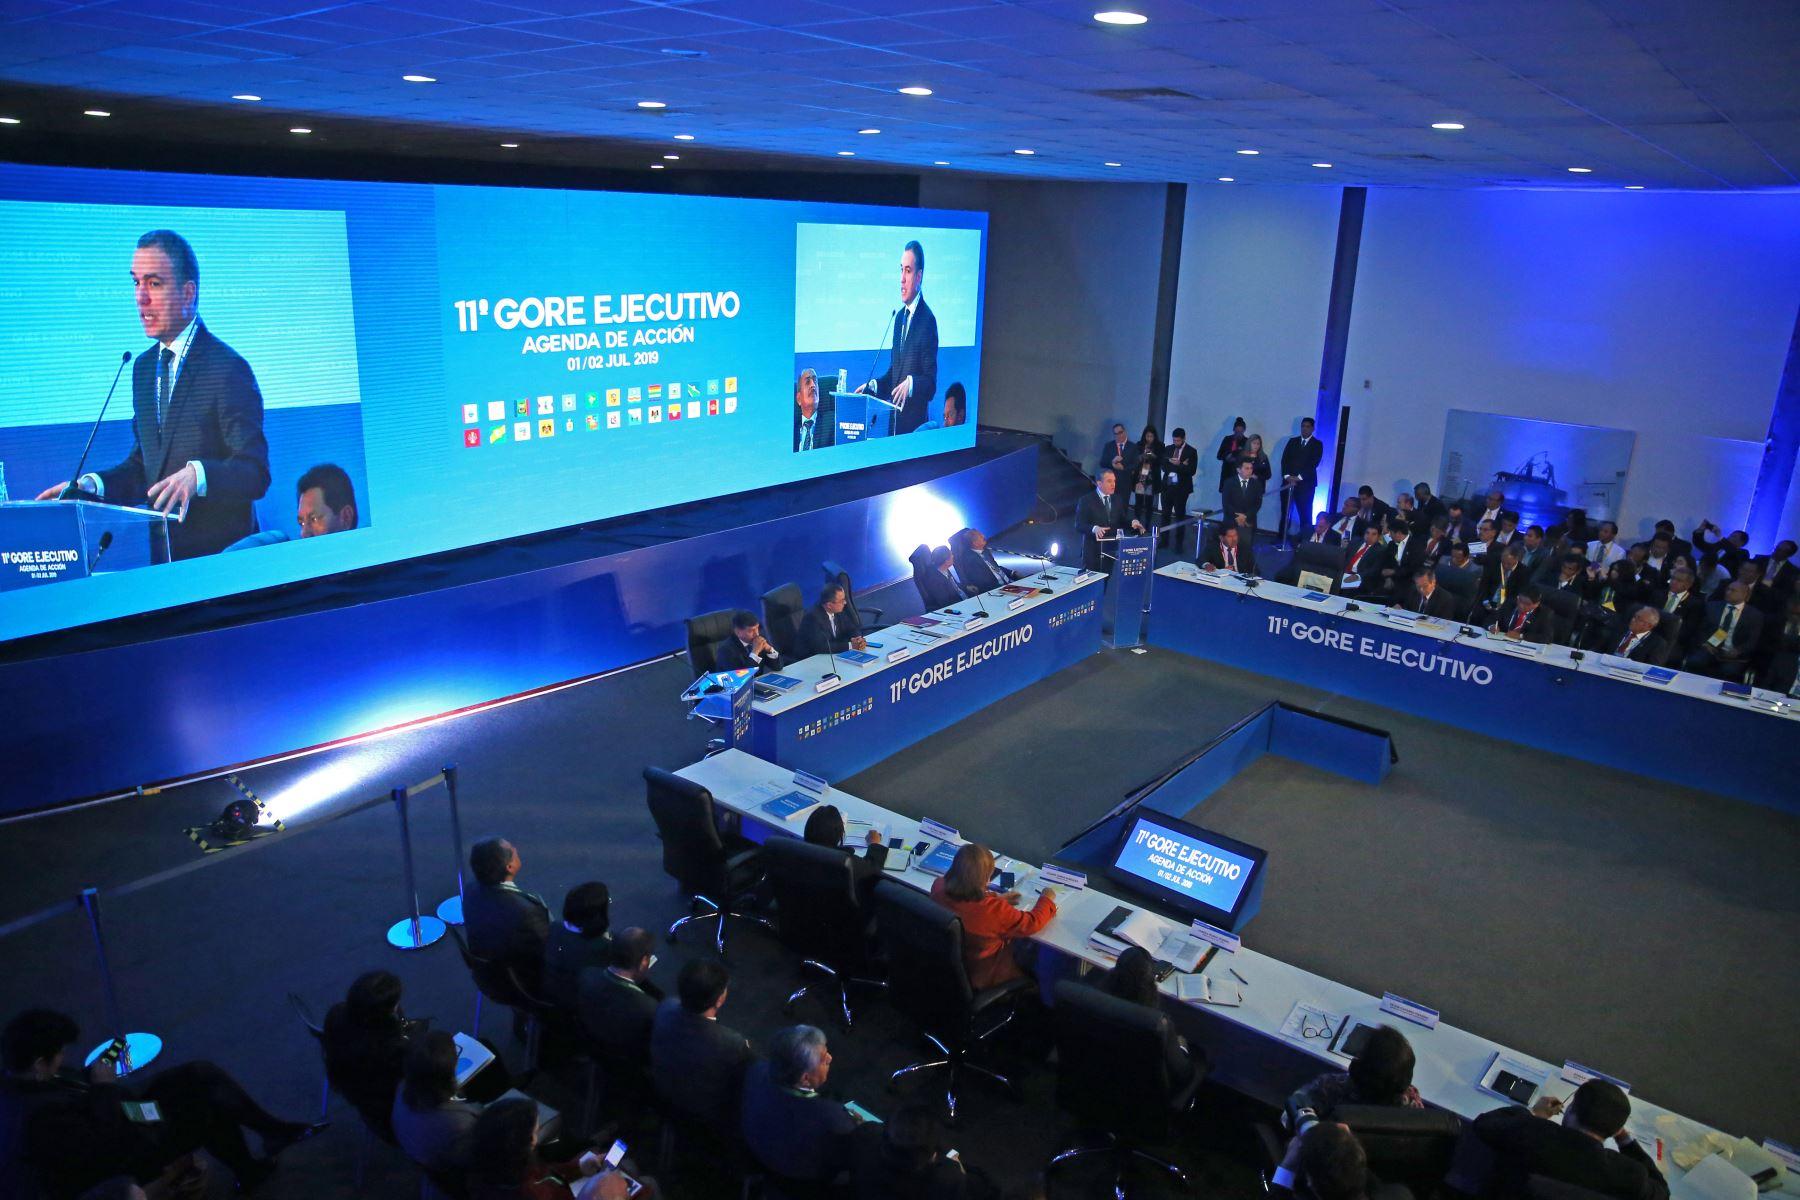 El presidente del Consejo de Ministros, Salvador del Solar,  inaugura el 11º Gore Ejecutivo en la Fortaleza Real Felipe del Callao. Foto: ANDINA/Vidal Tarqui